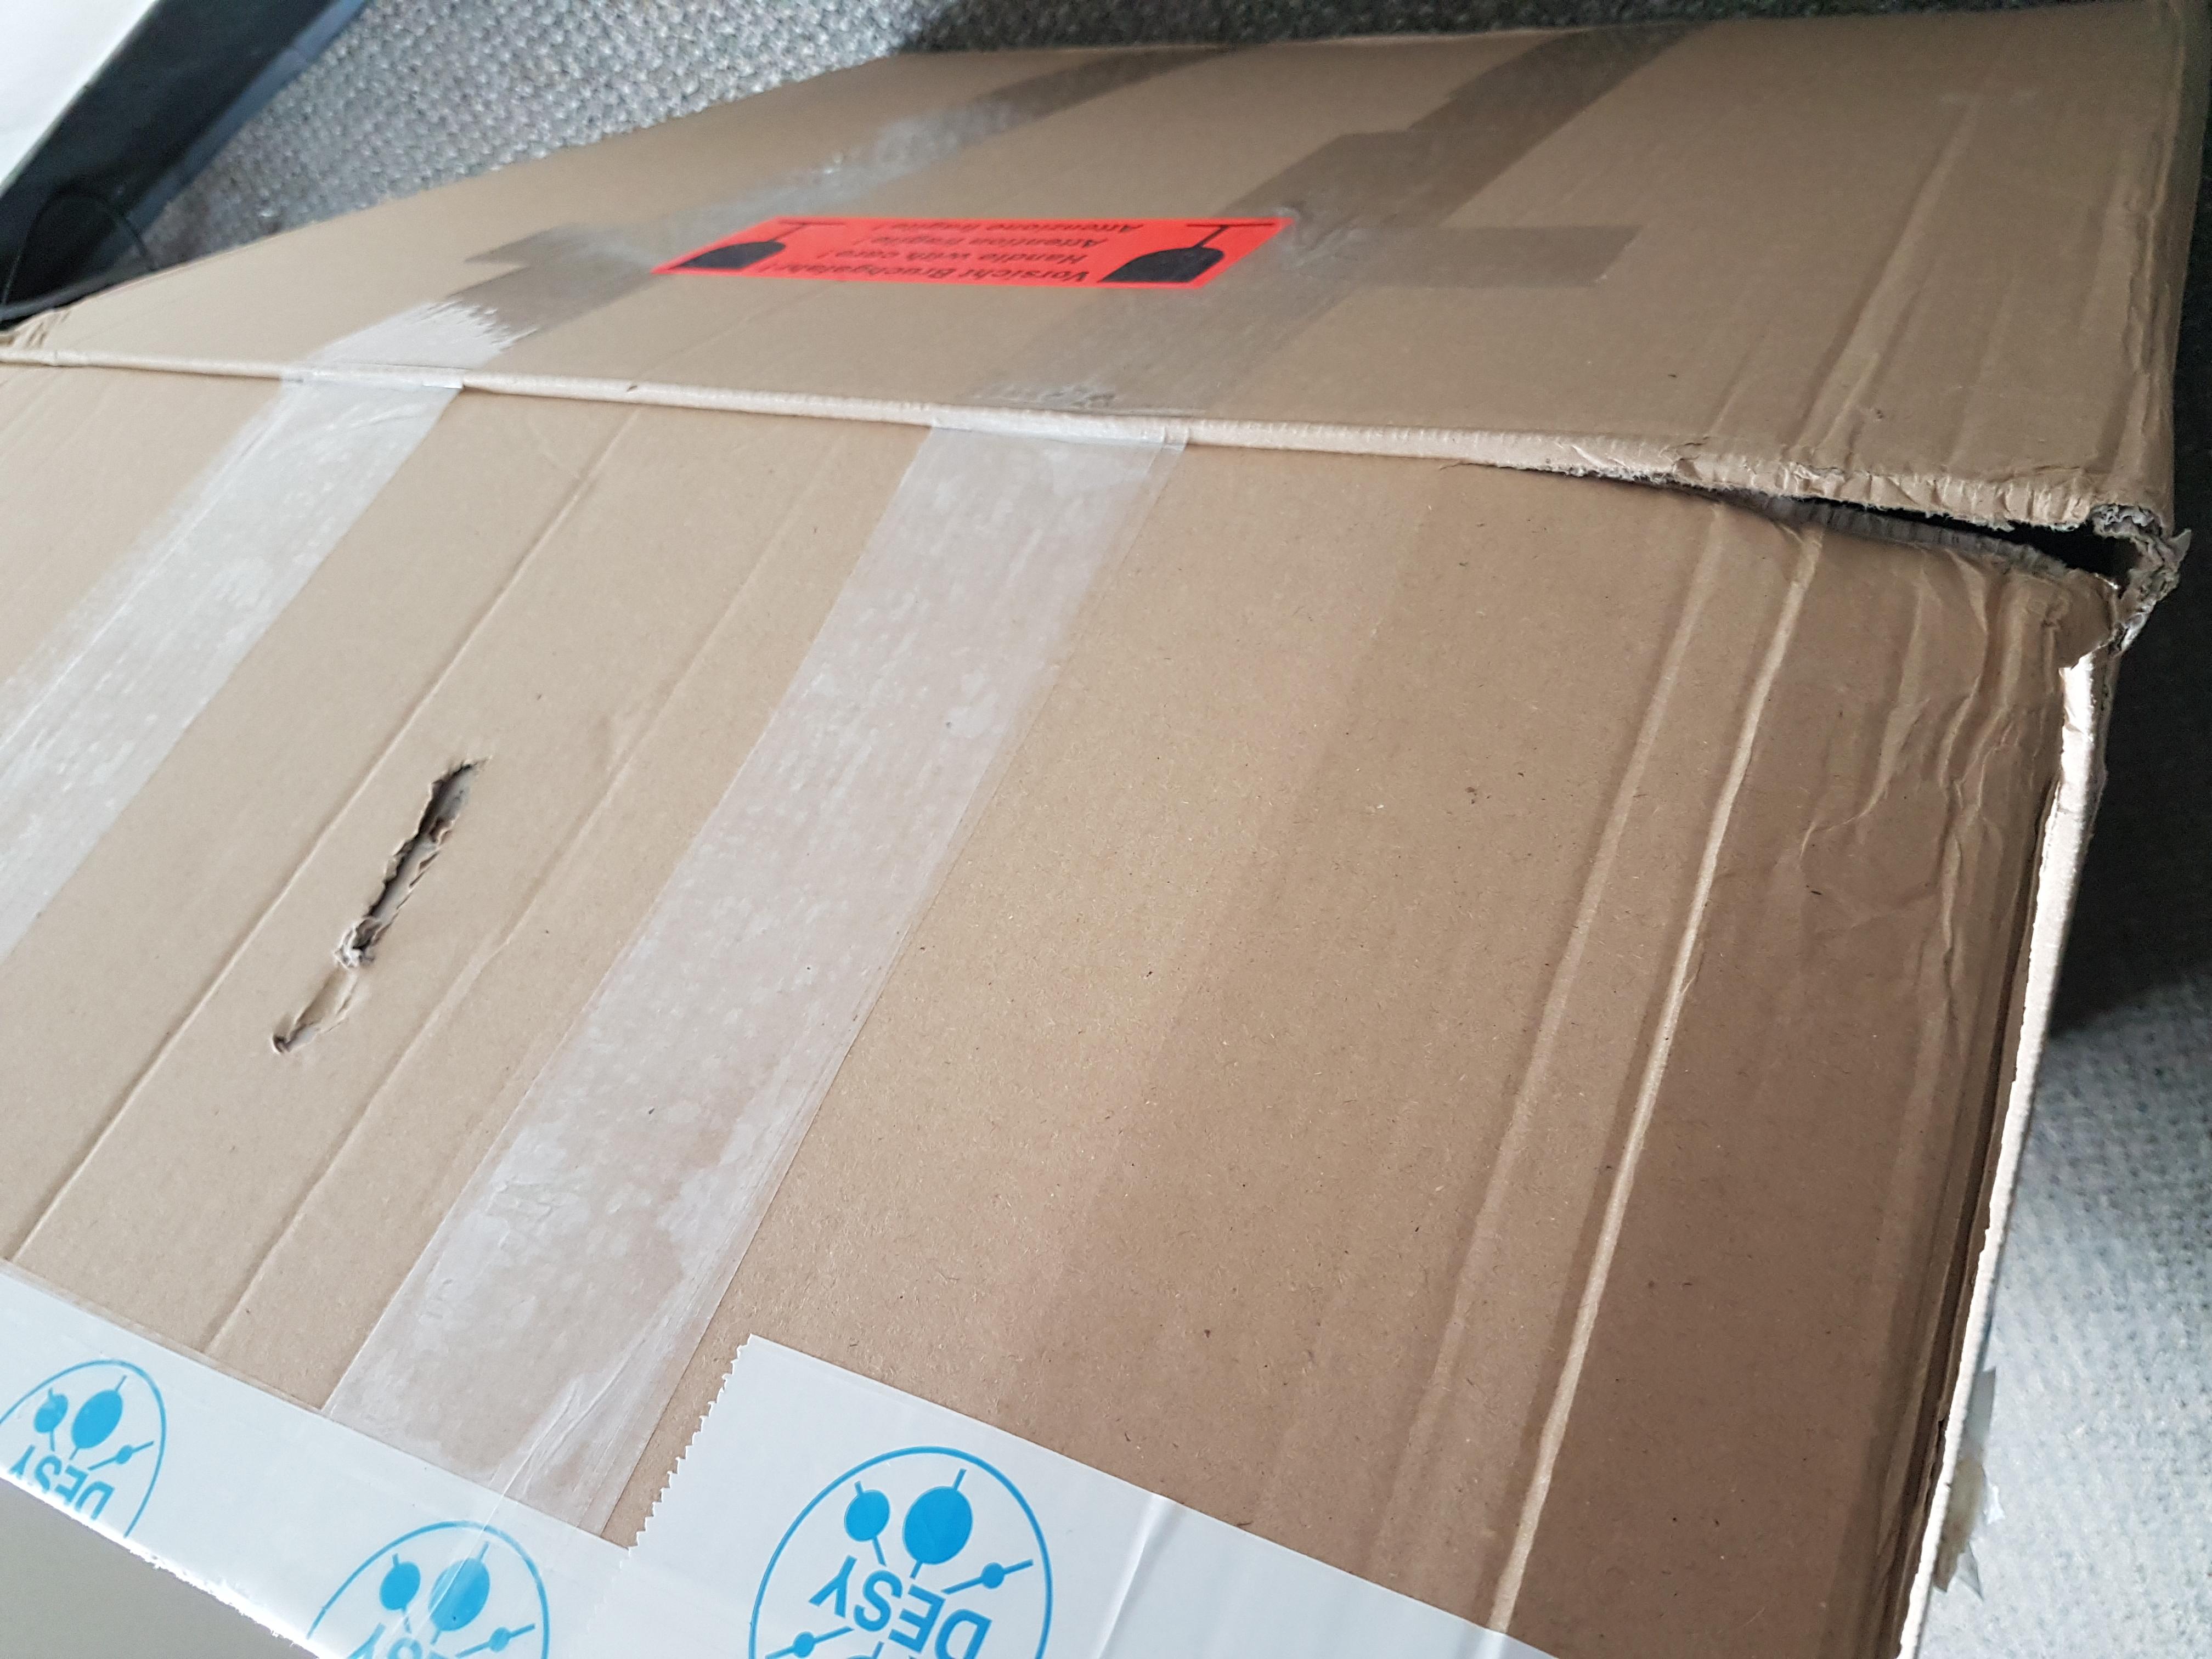 box-3-tear_20180129_110635.jpg